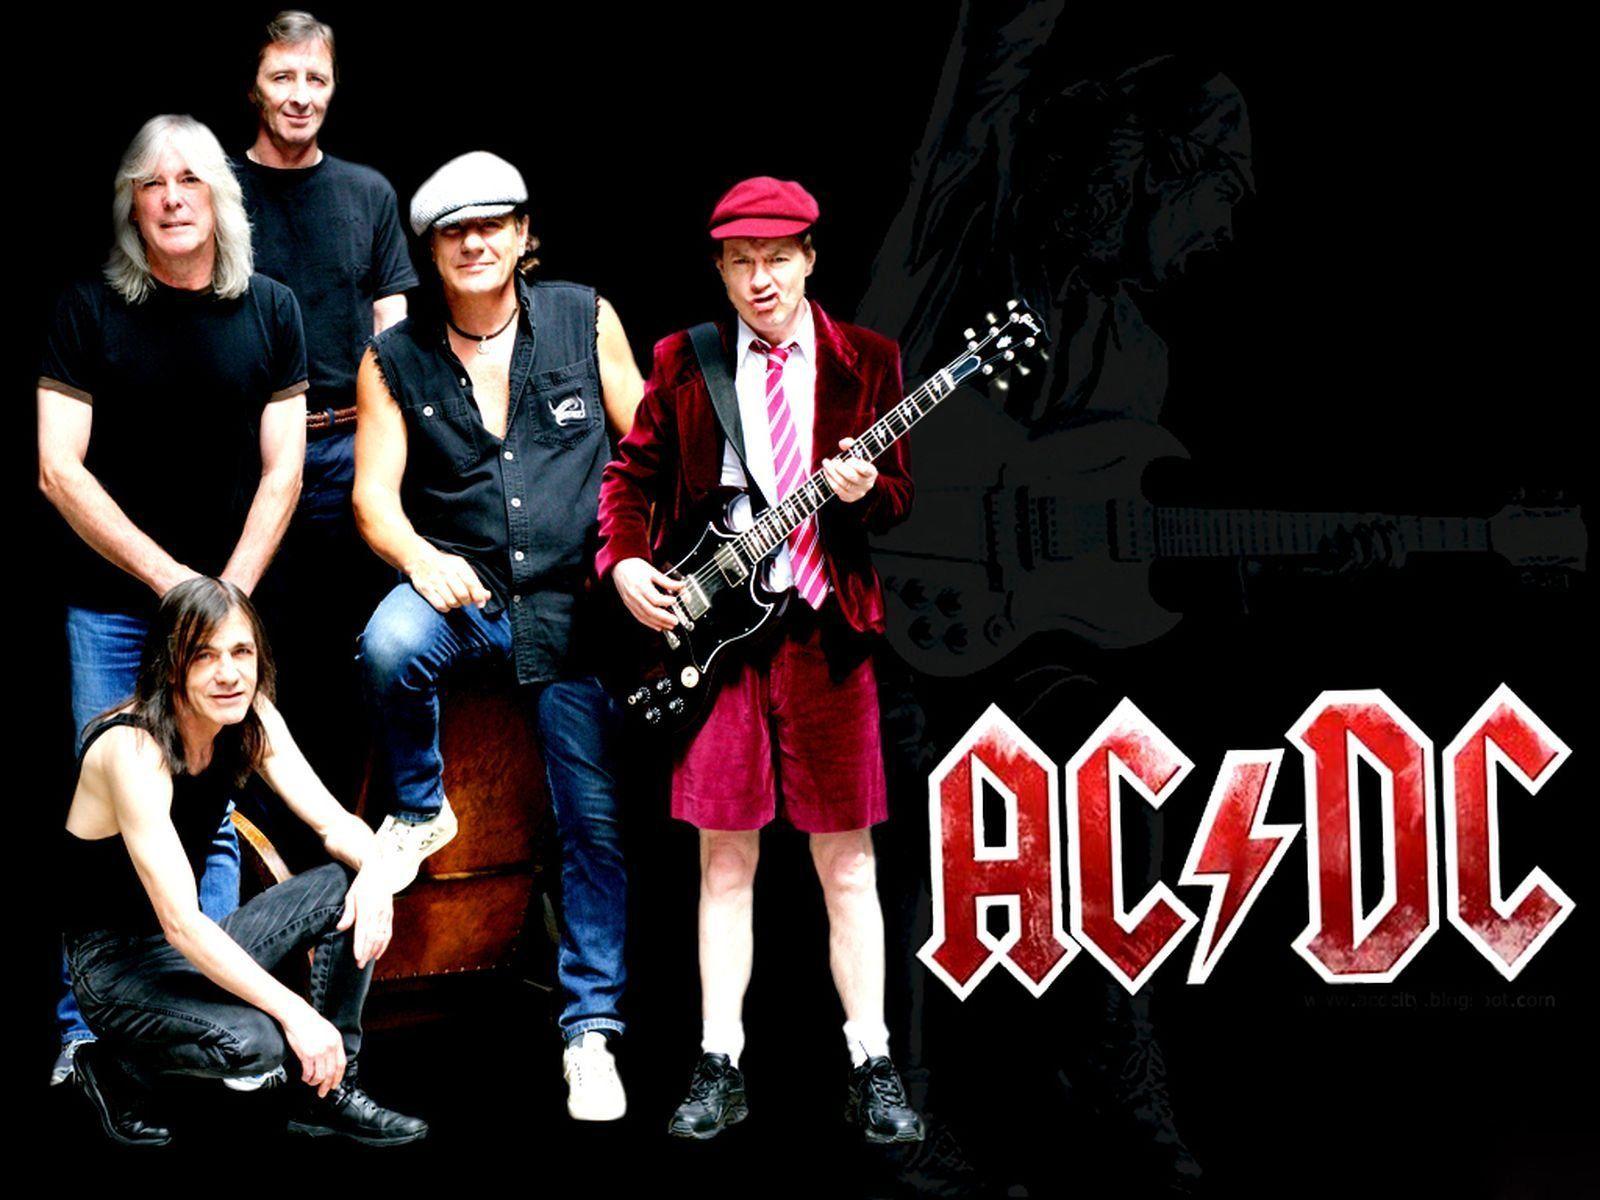 Resultado de imagen para banda australiana AC/DC